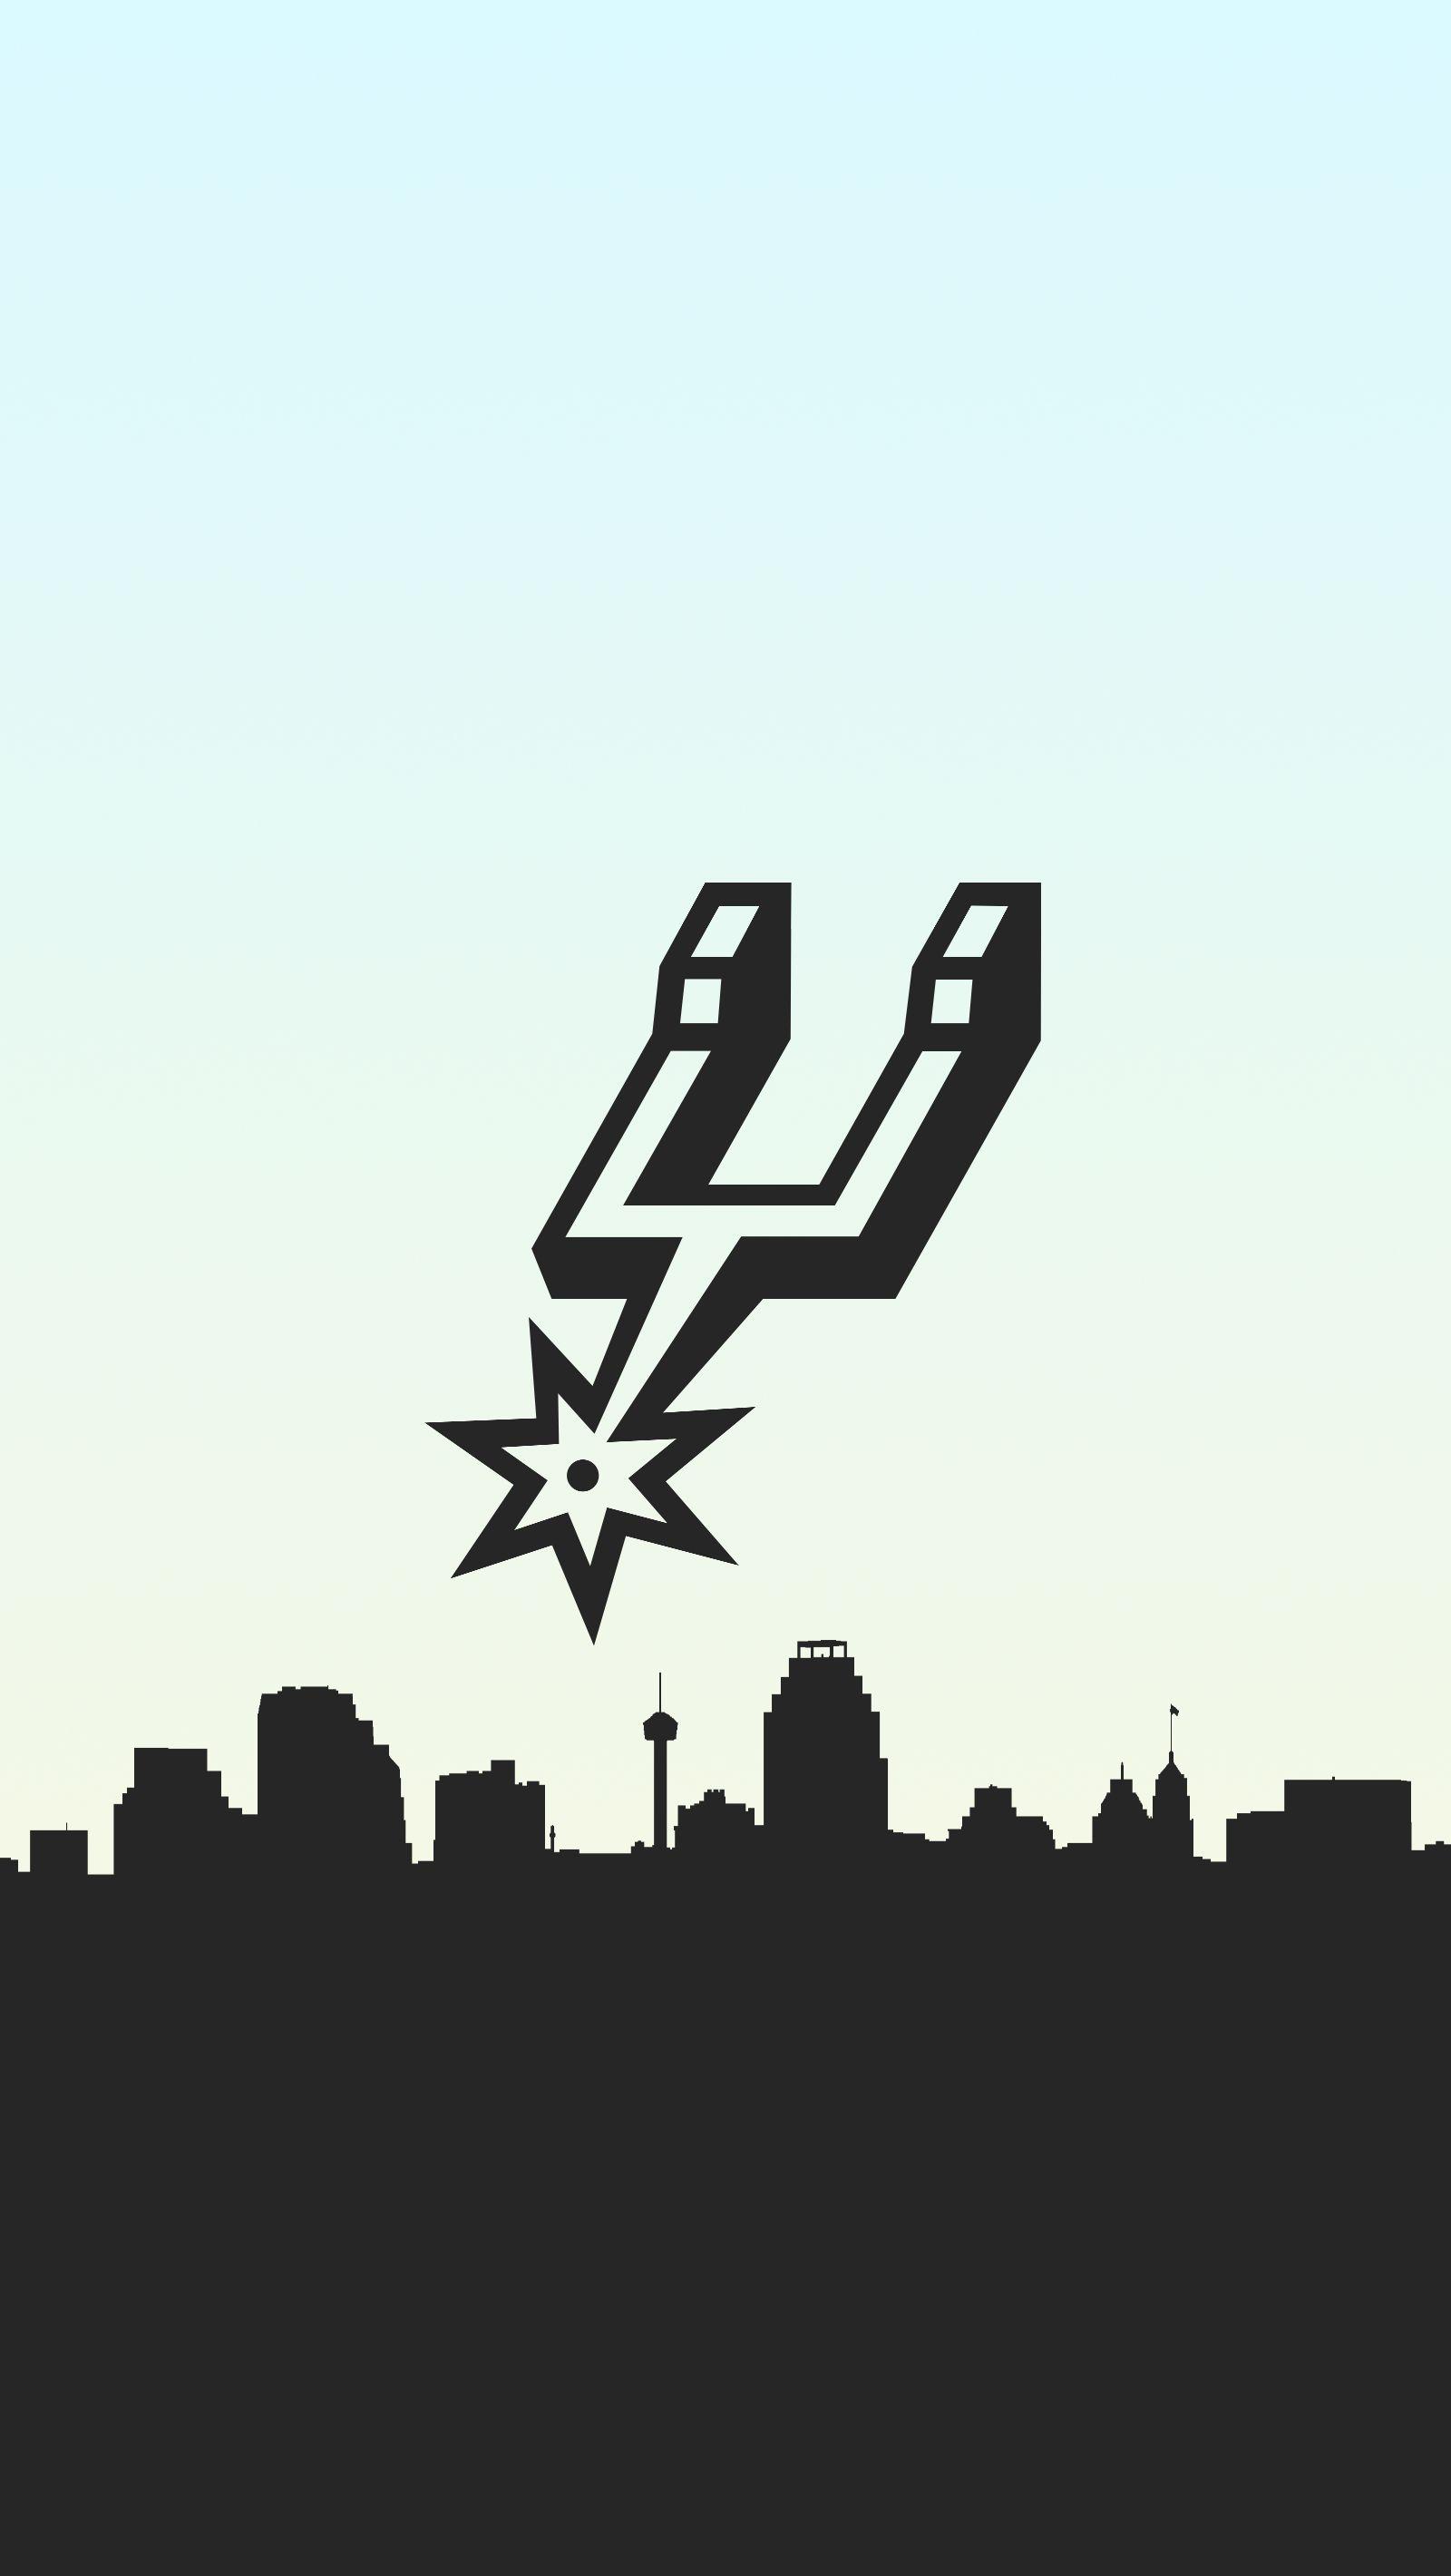 San Antonio Spurs Basketball Phone Background San Antonio Spurs Basketball San Antonio Spurs Logo Spurs Logo